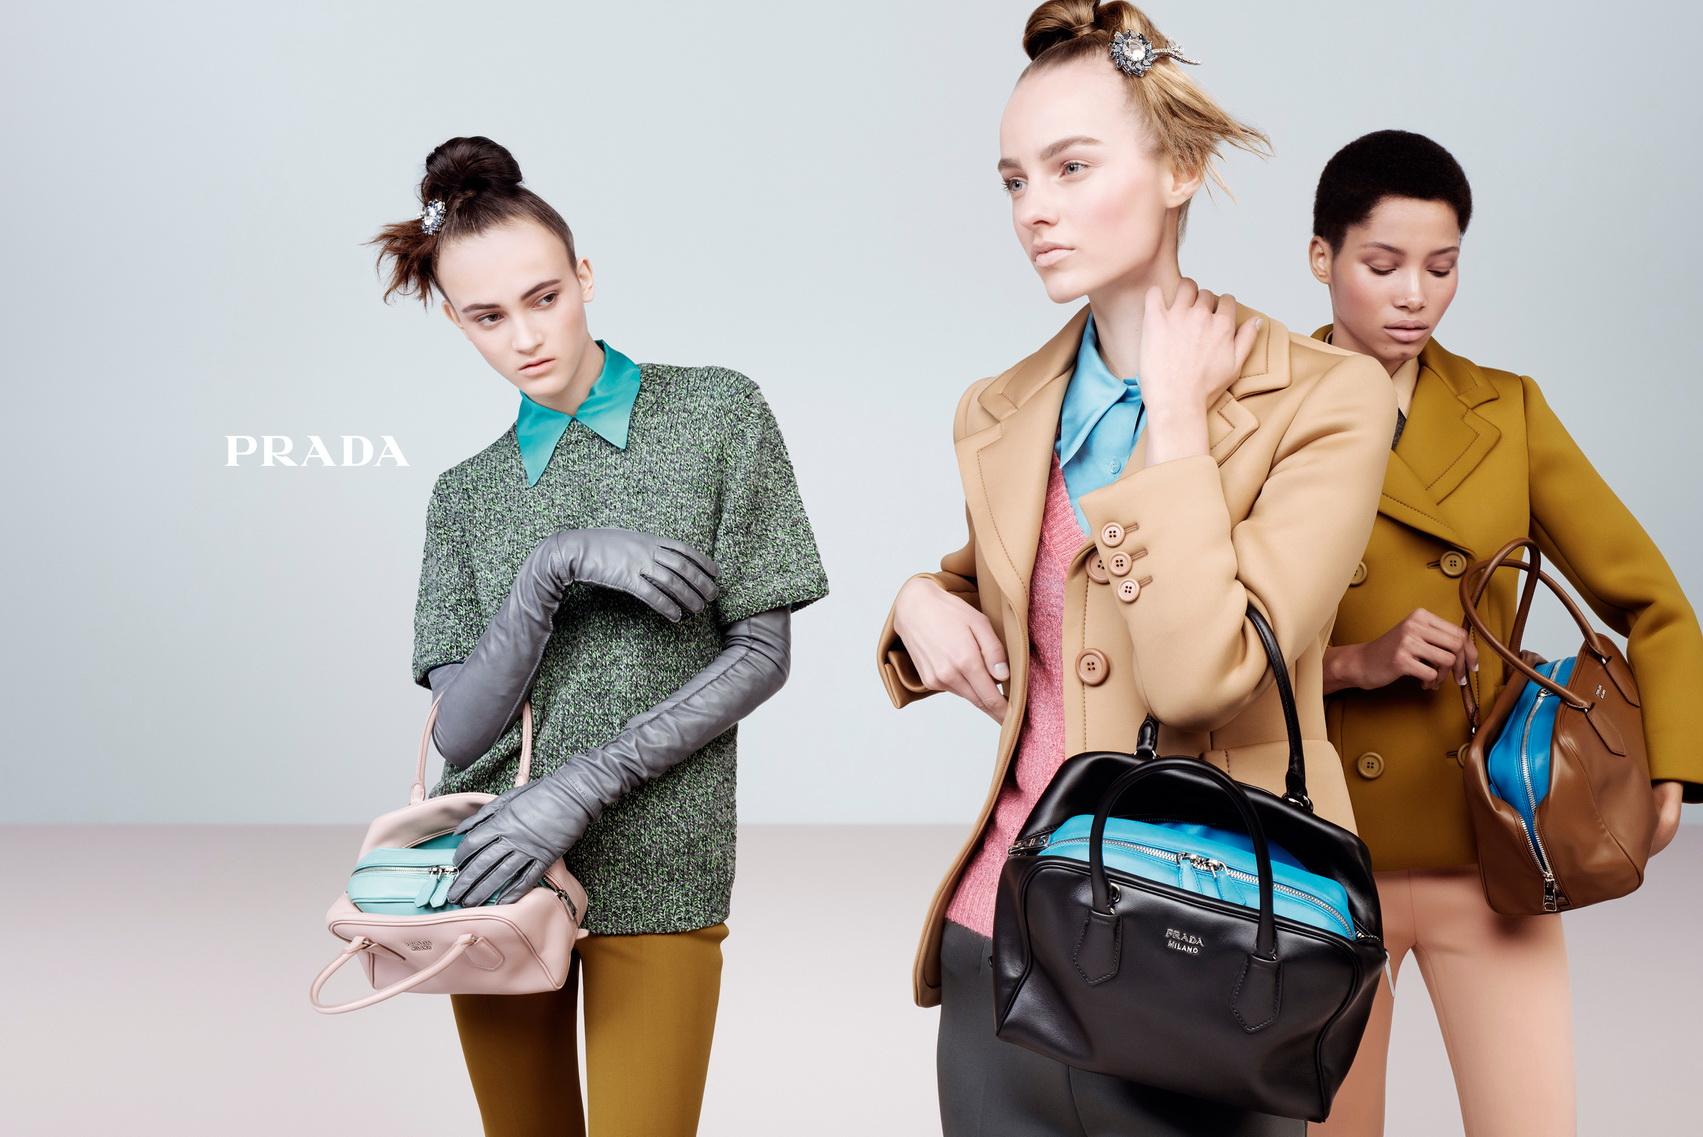 Prada-FW15-Womenswear-Adv-Campaign-image_02